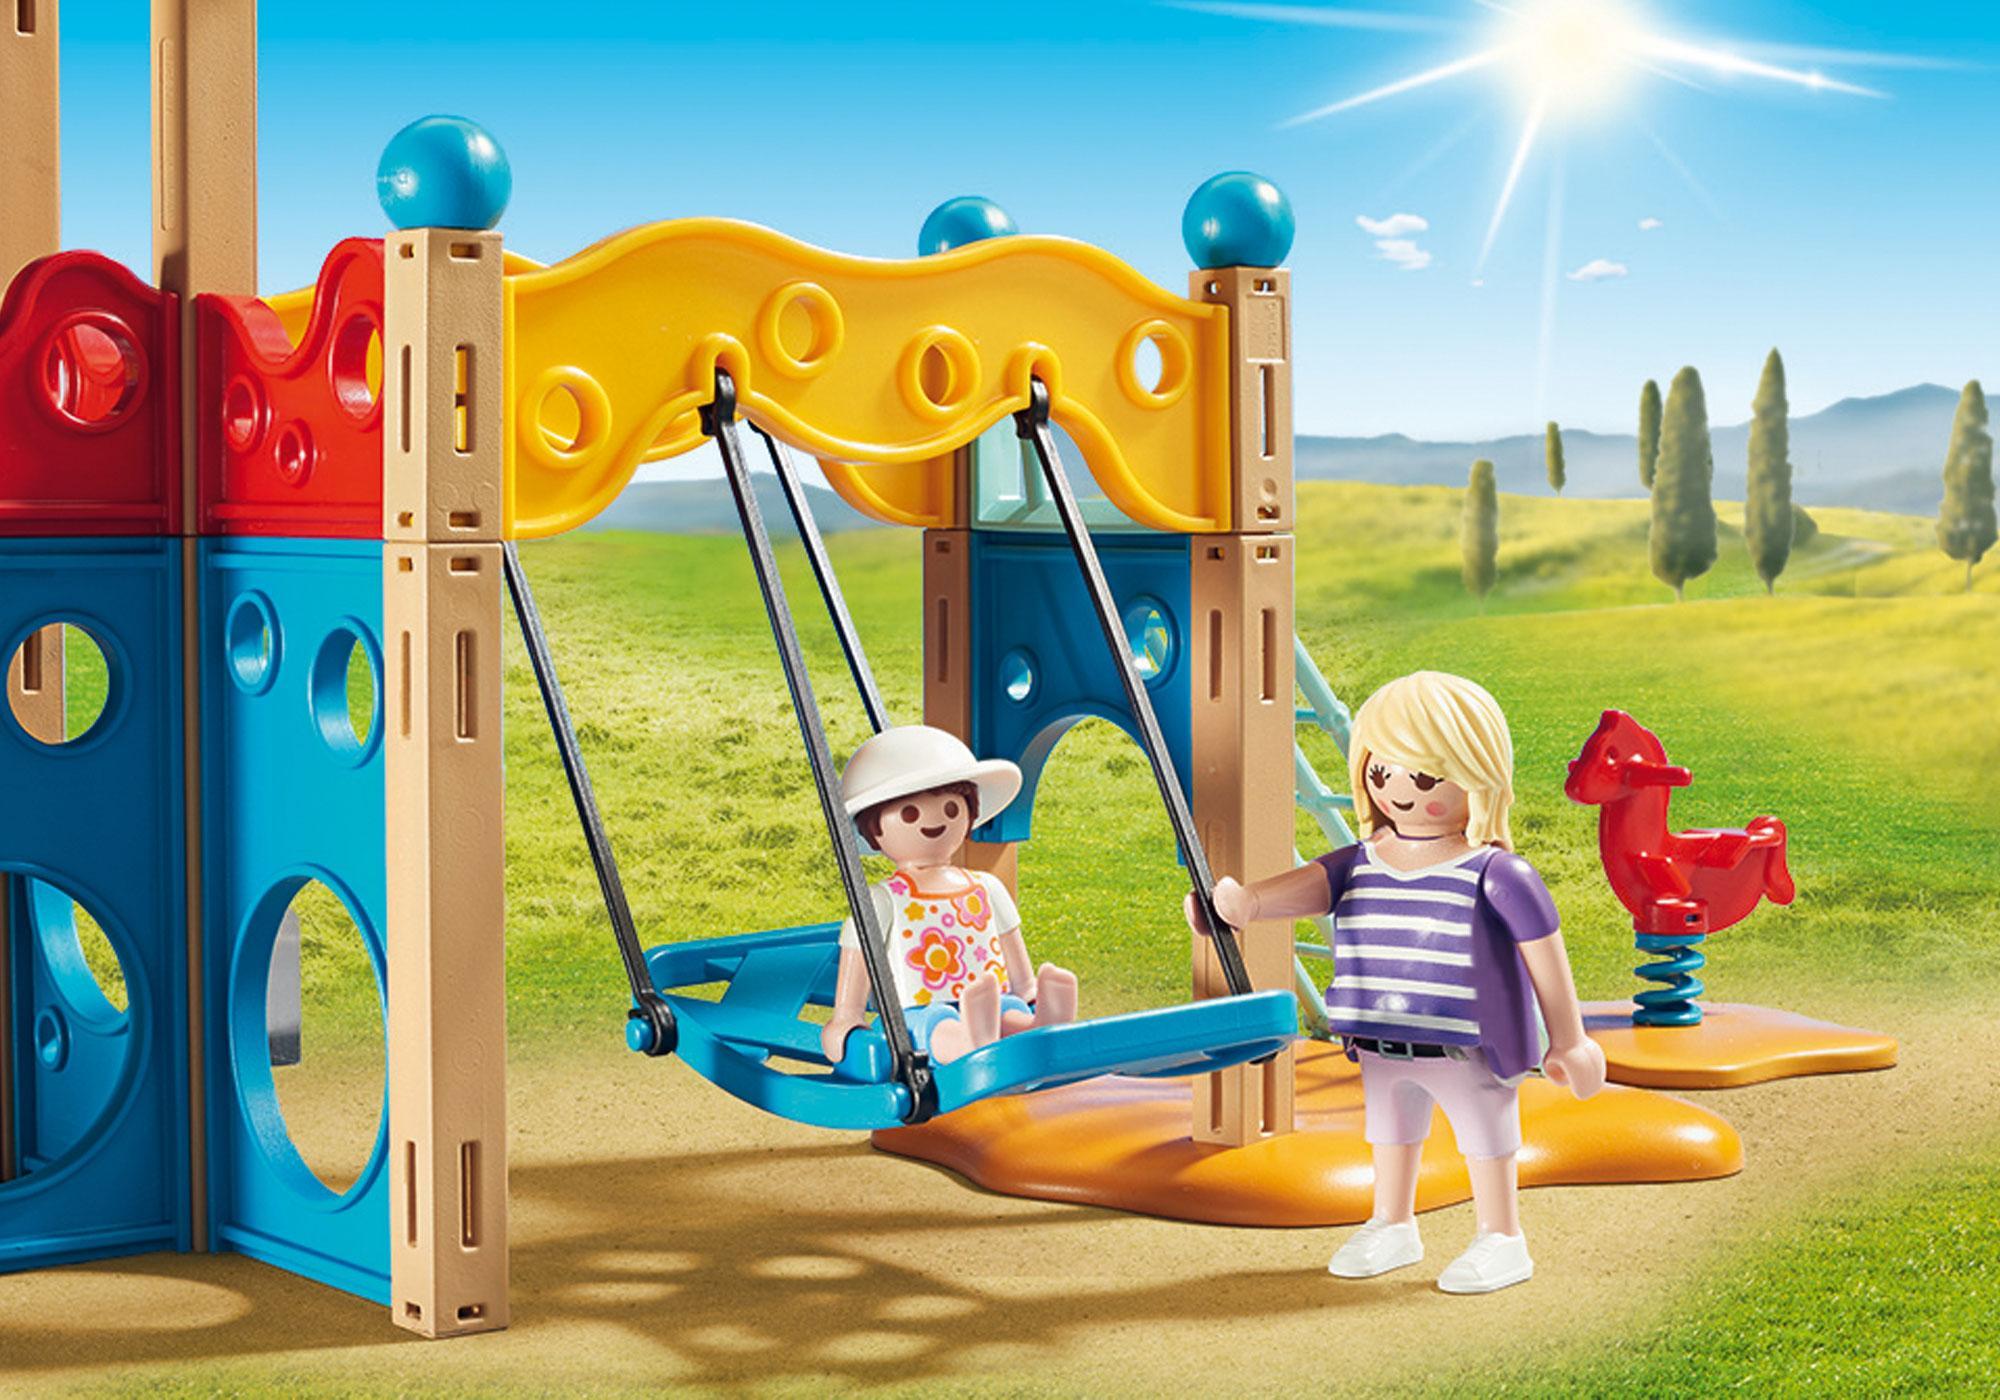 http://media.playmobil.com/i/playmobil/9423_product_extra3/Grote speeltuin